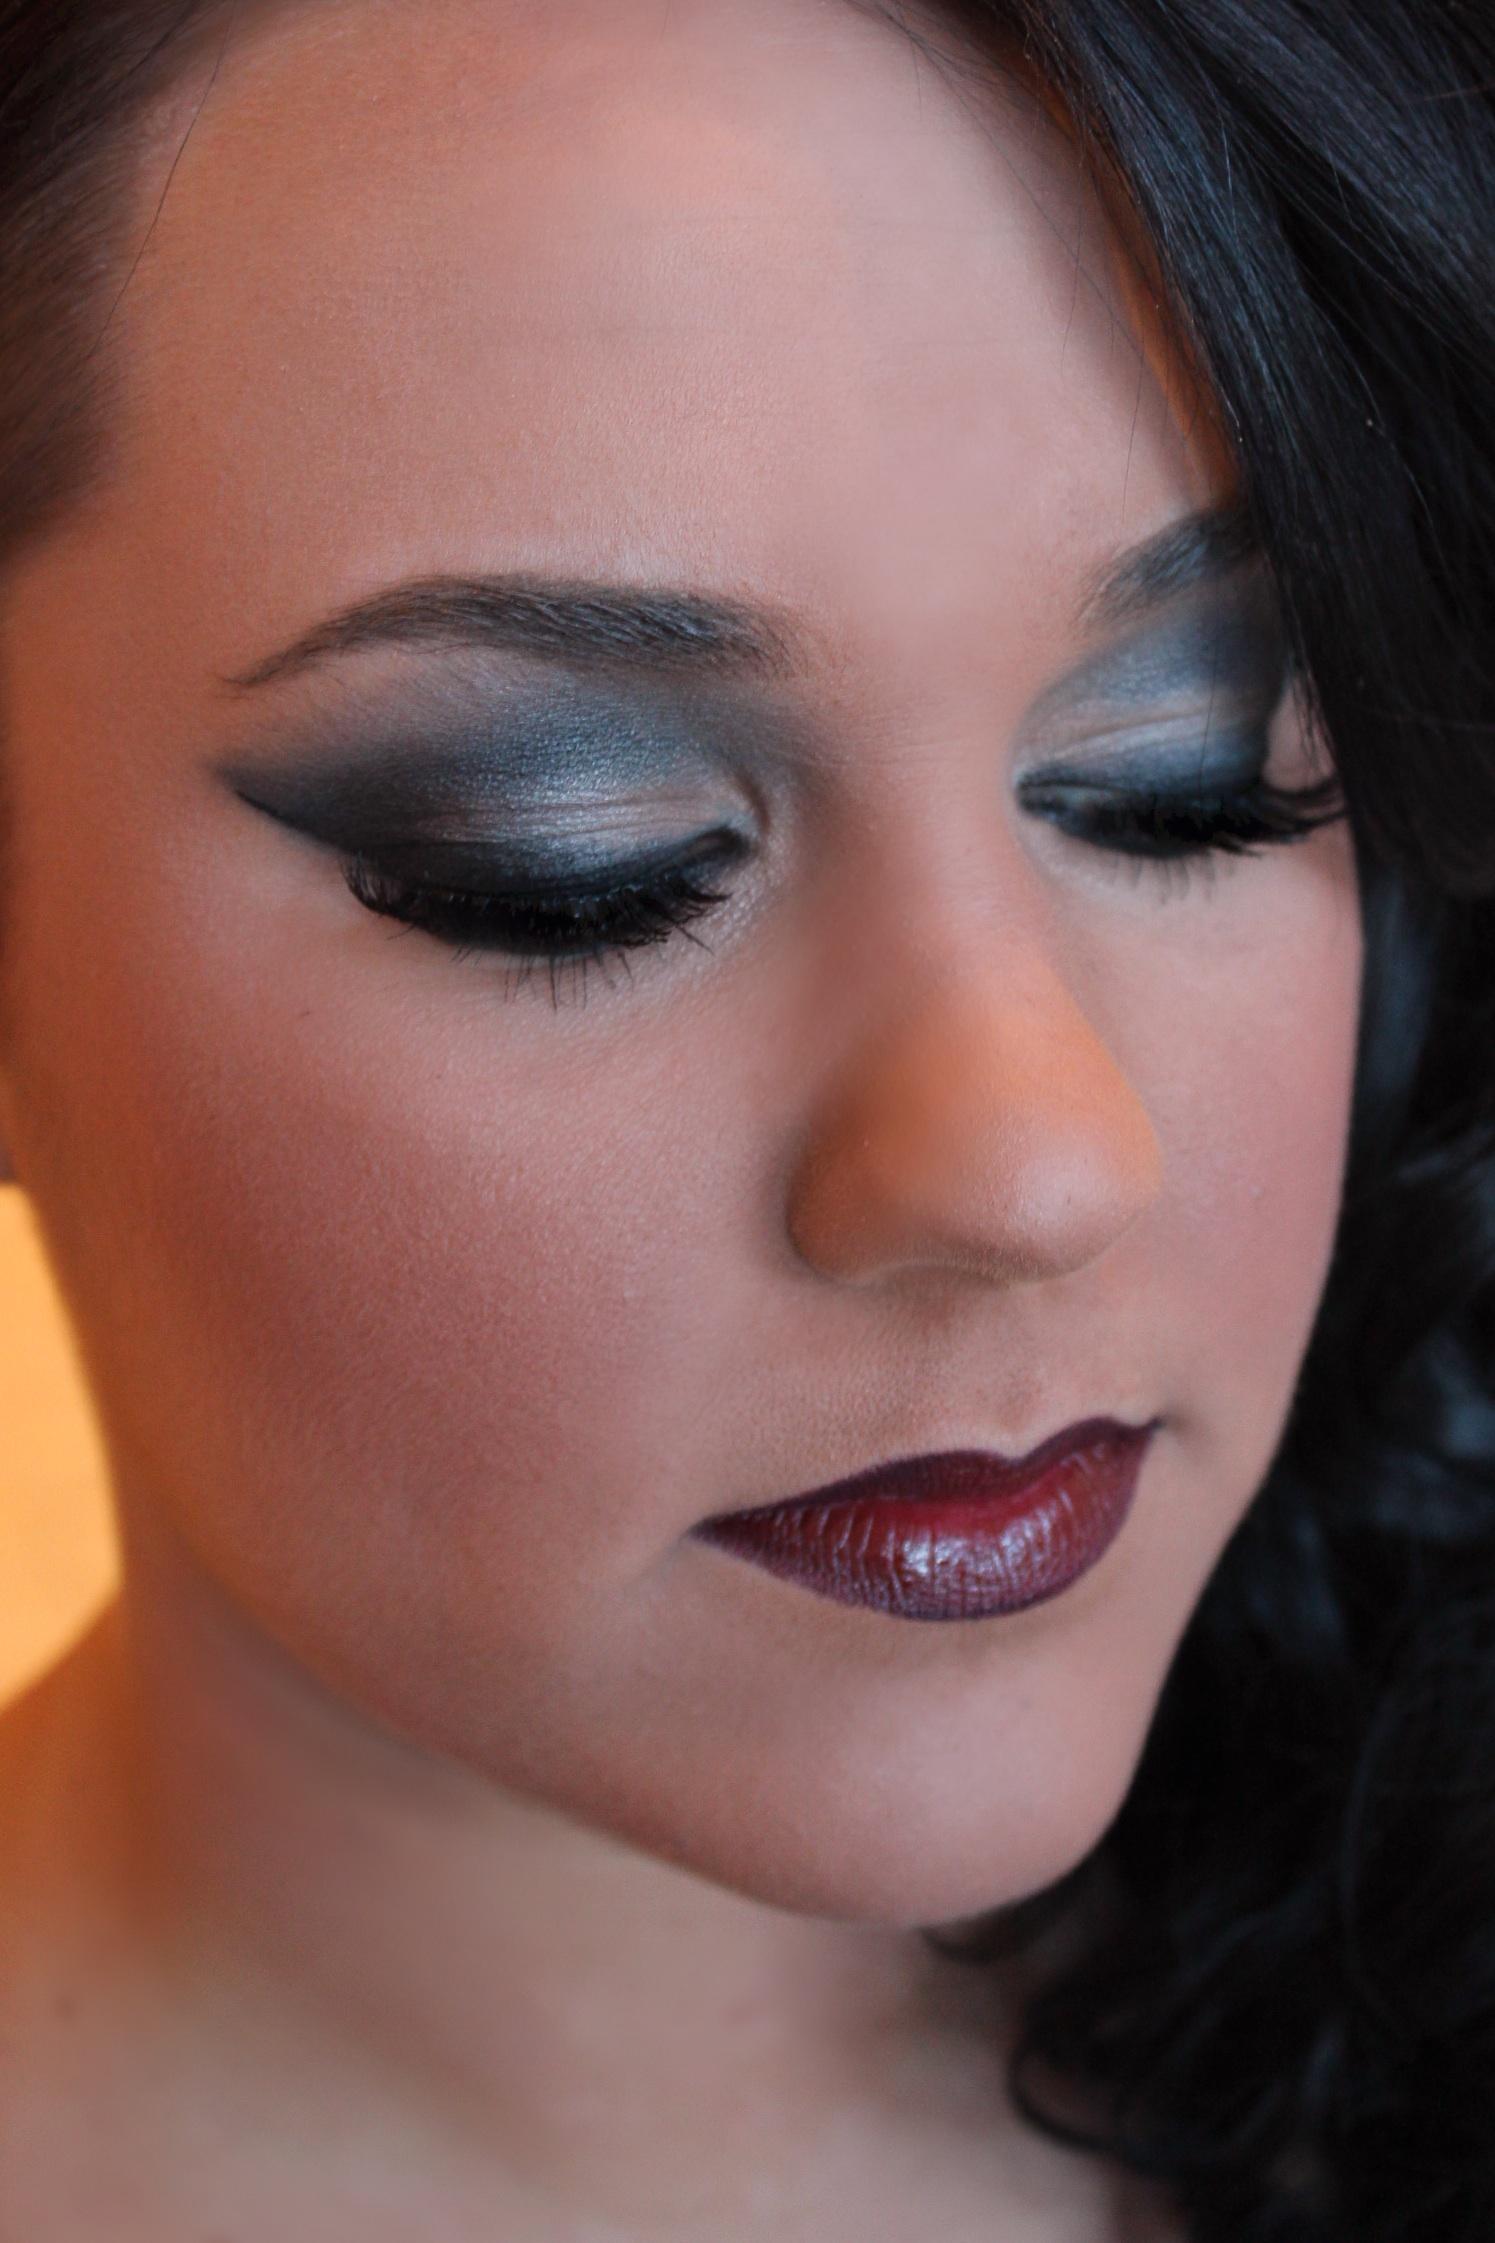 Makeup Looks From The Hungarian Ball Joey Claeyssen Makeup Artistry